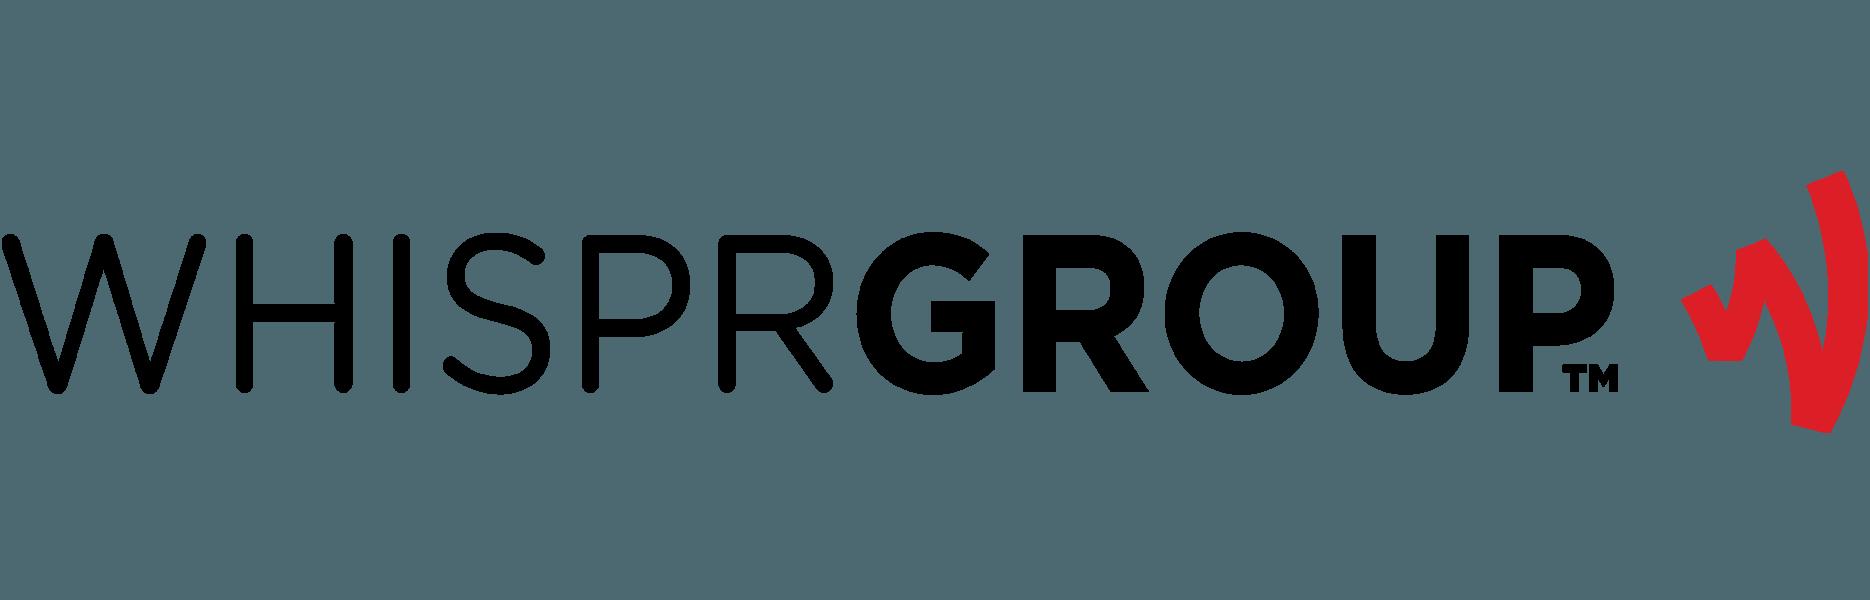 Whispr Group Logo